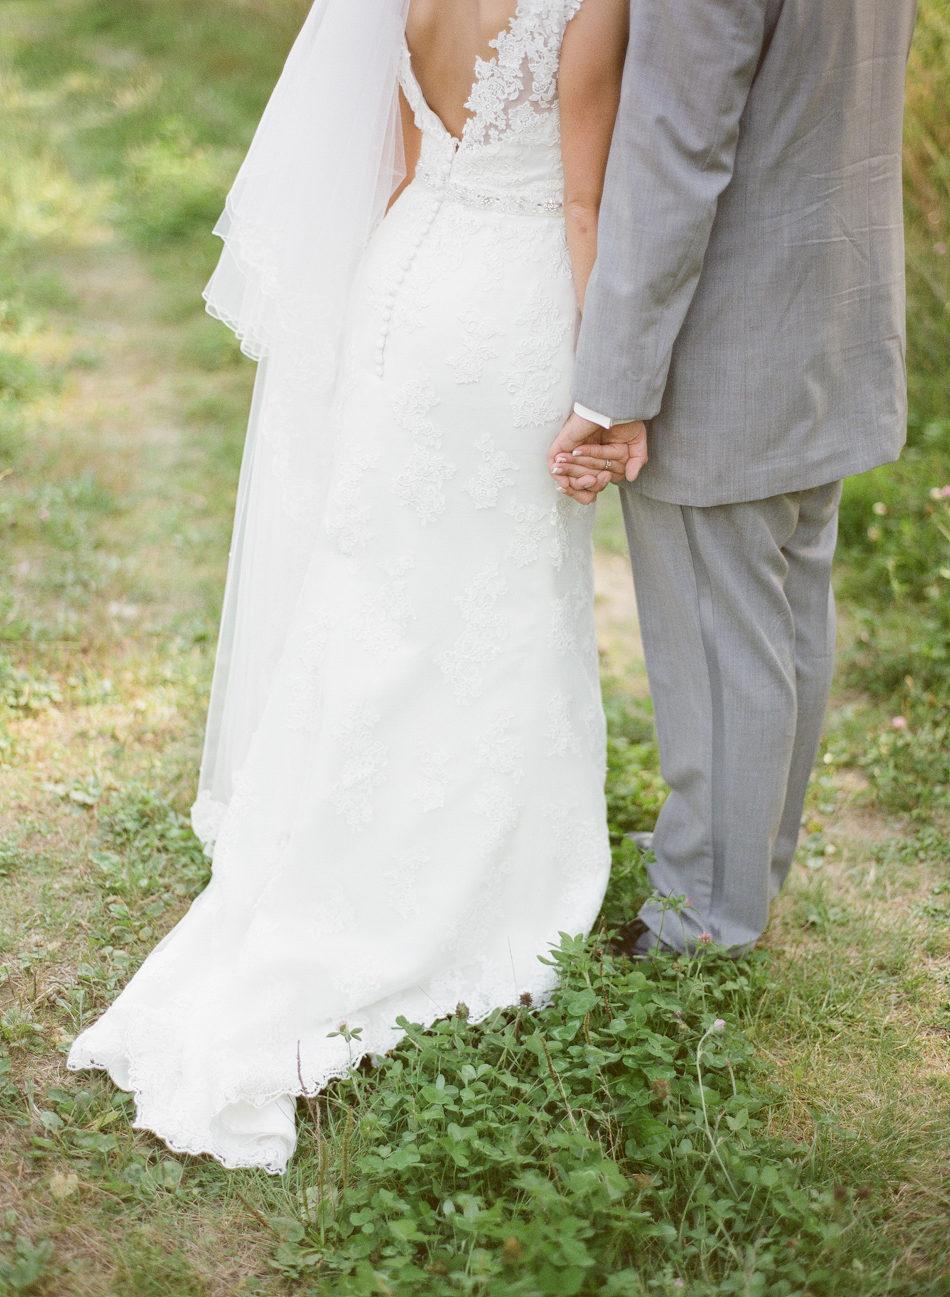 Wedding Dress Quilt 92 Popular